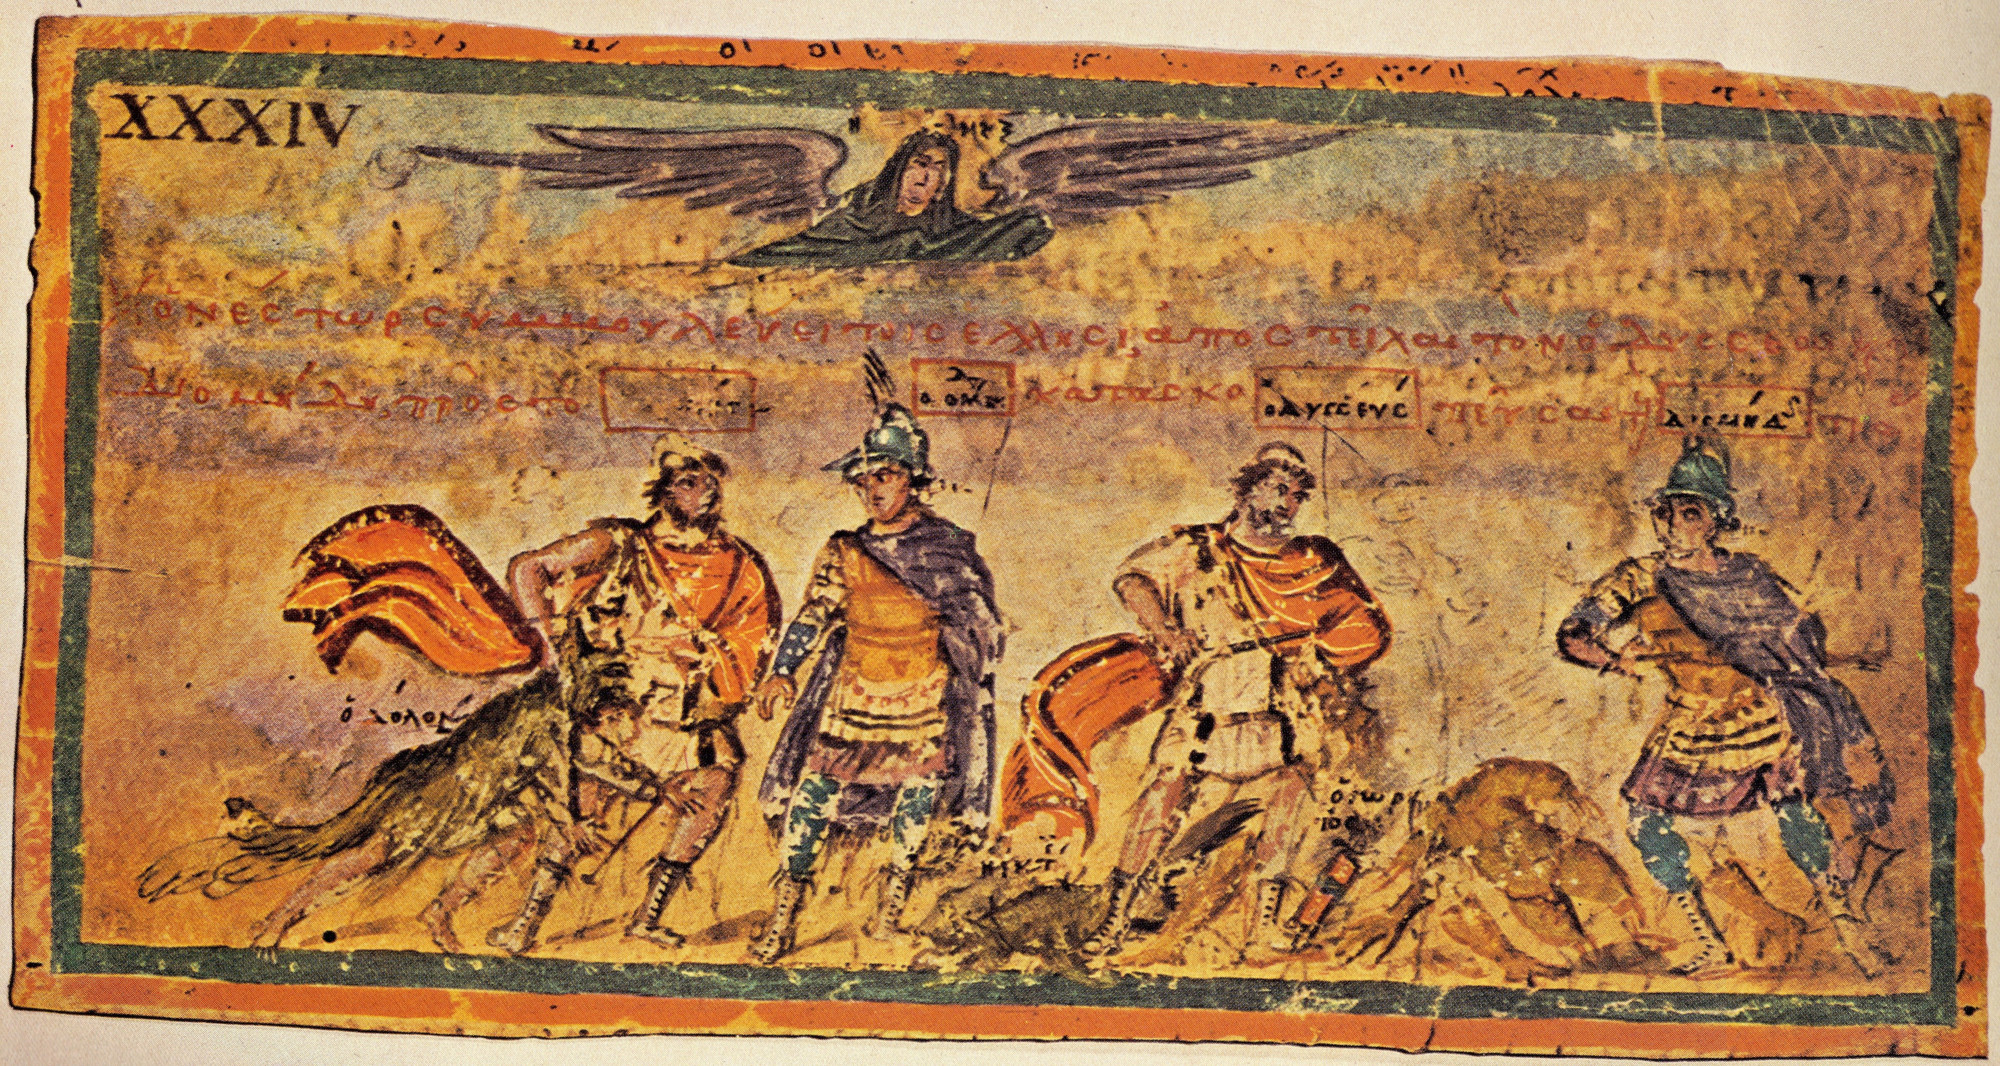 "Illustration in der Ilias Ambrosiana, 5. Jh. n. Chr. Mailand, Bibliotheka Ambrosiana Cod. F 205 inf. Nr. 34.<br>Quelle: <a href=""https://commons.wikimedia.org/wiki/File:AmbrosianIliadPicXXXIVCaptureDolon.jpg"">Dsmdgold / Wikimedia Commons</a><br> Lizenz: Public Domain"